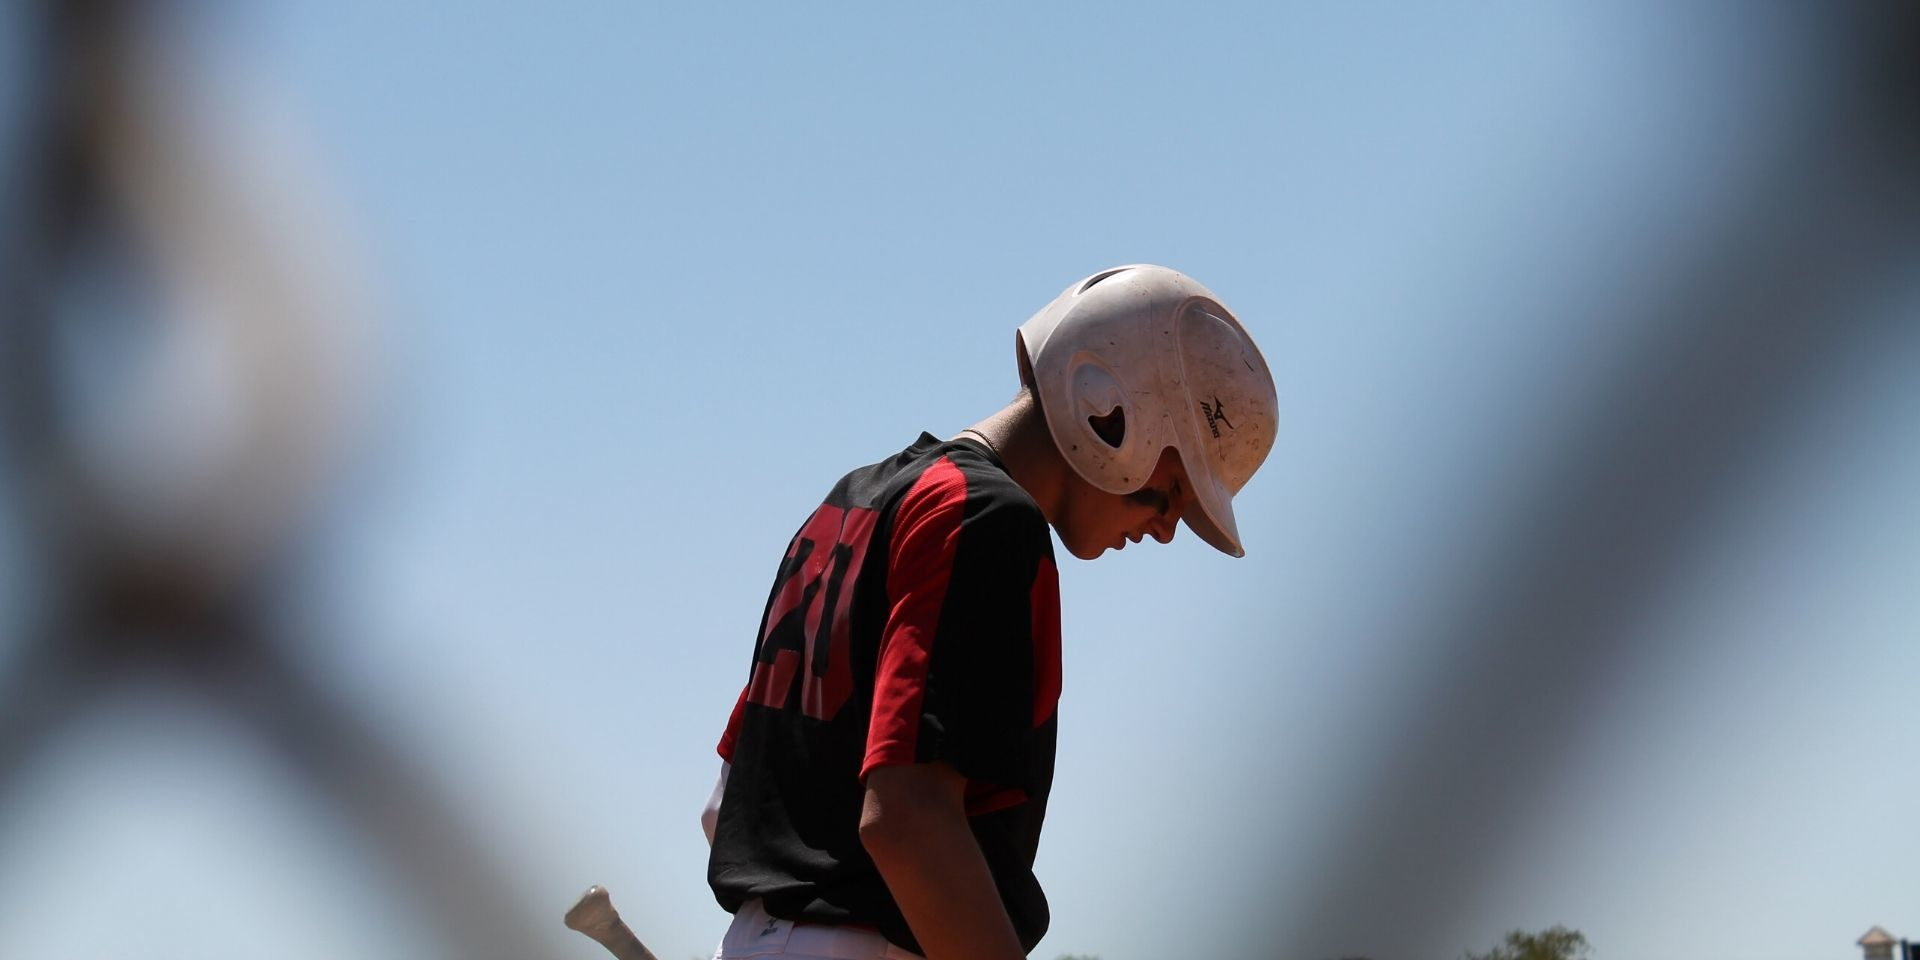 baseball-player-up-to-bat